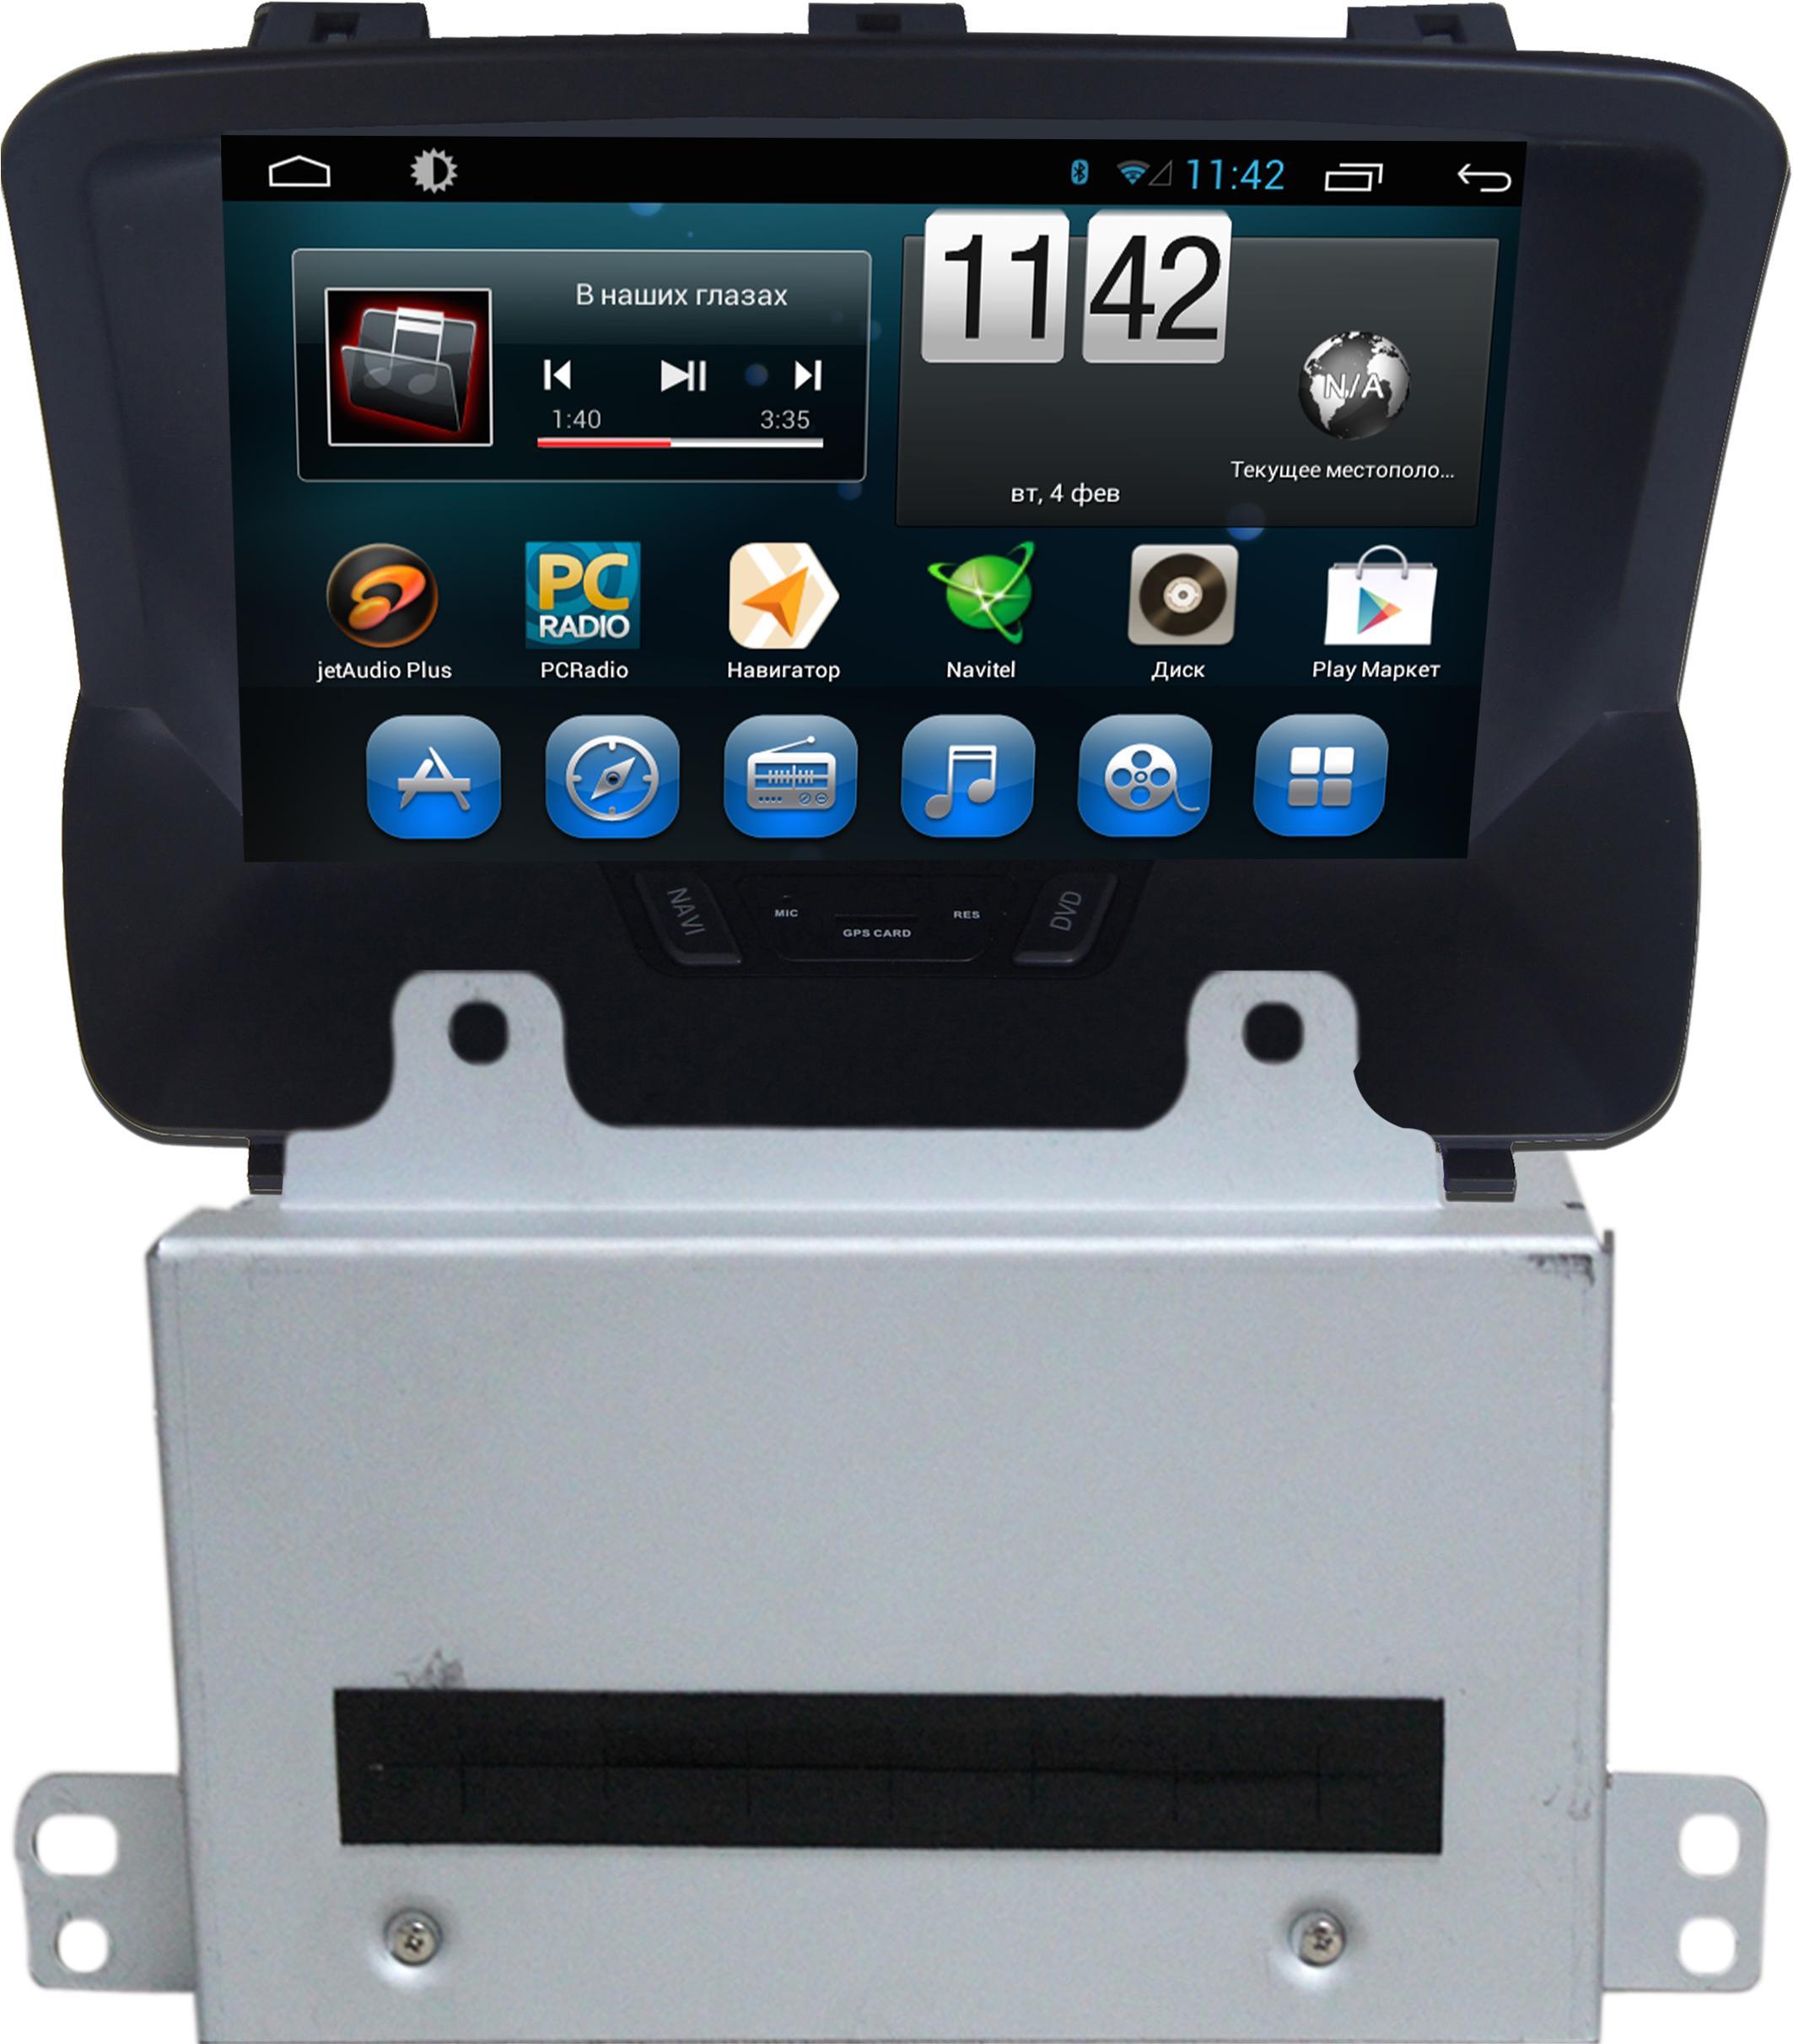 Штатное головное устройство ШГУ на Android 4 Opel Mokka X-Sound AS-8040